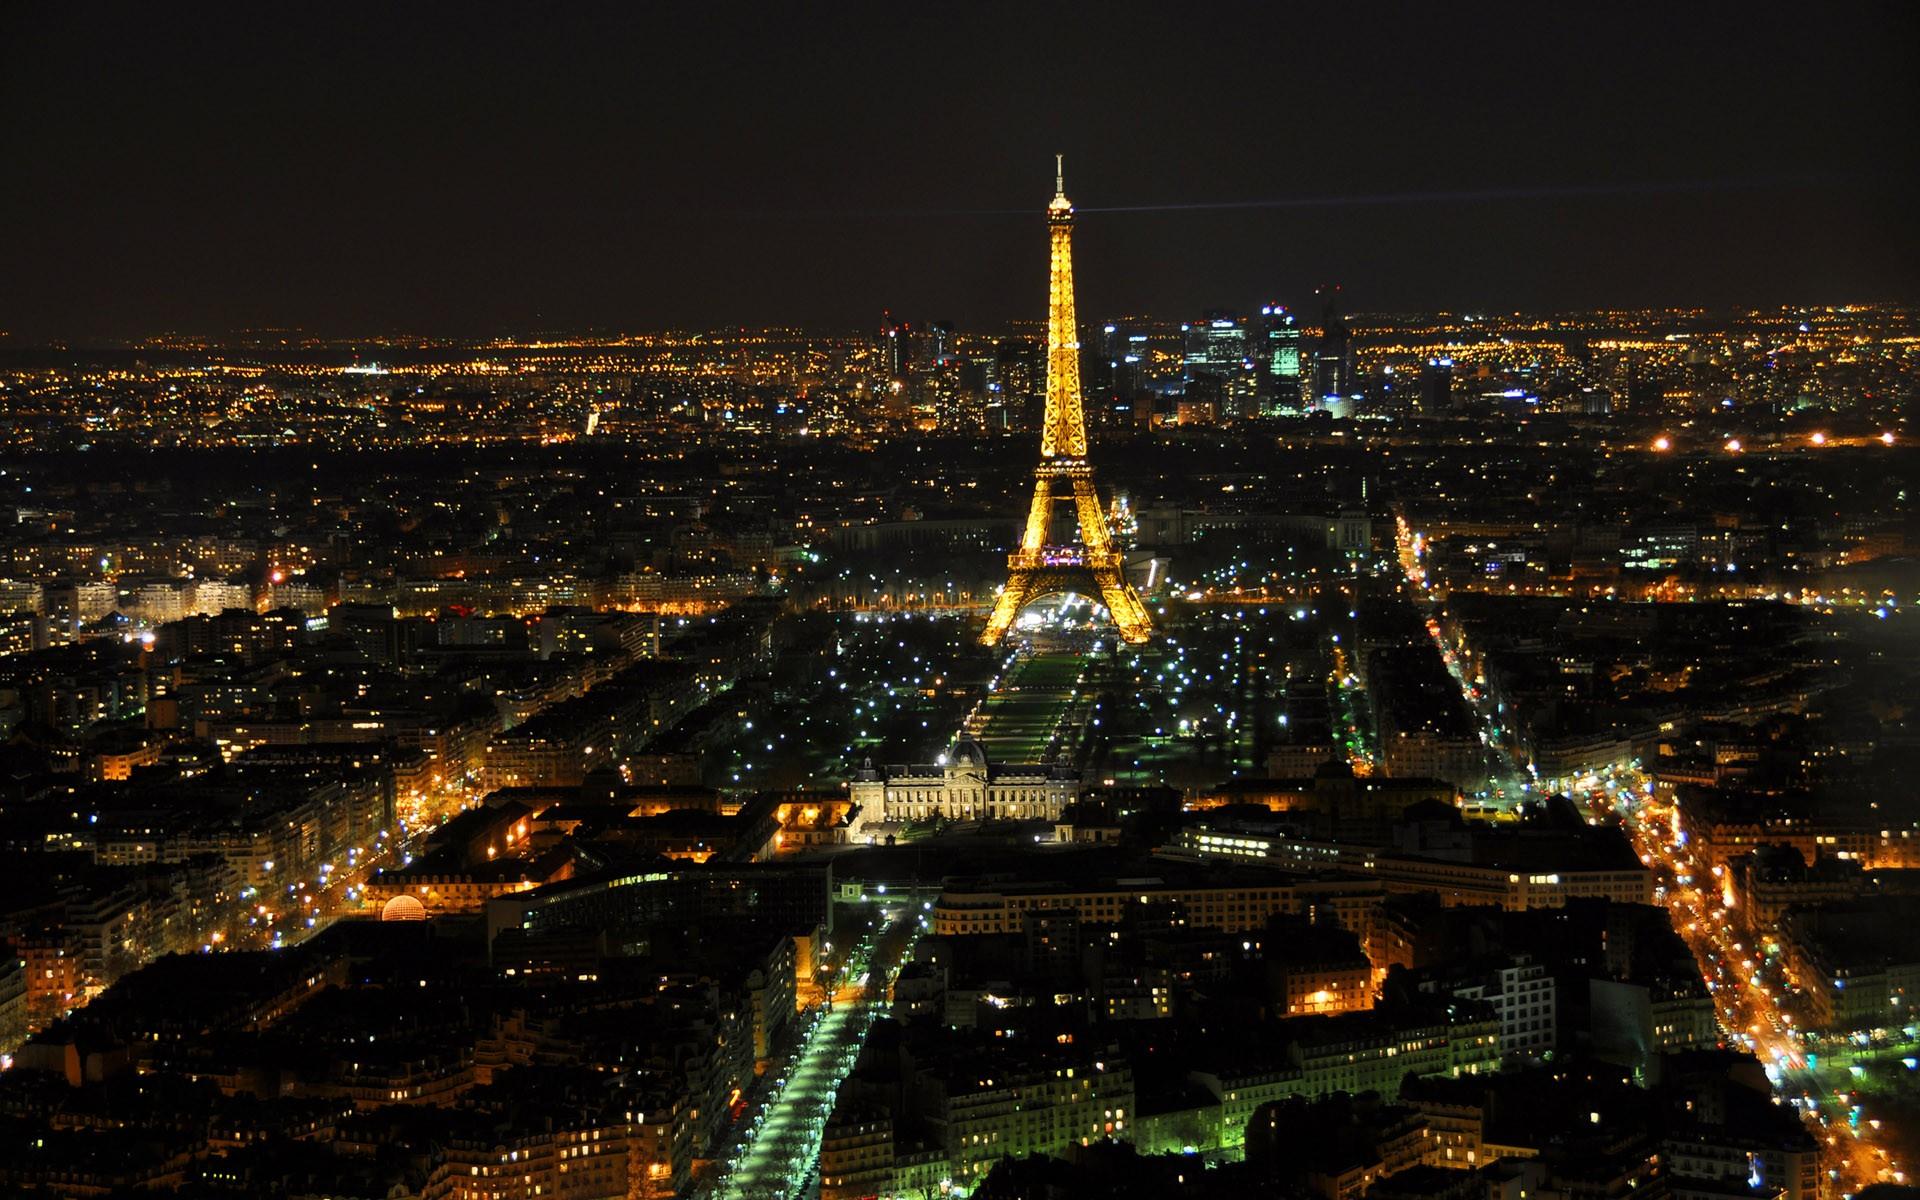 Eiffel Tower Hd Wallpaper Background Image 1920x1200 Id 192980